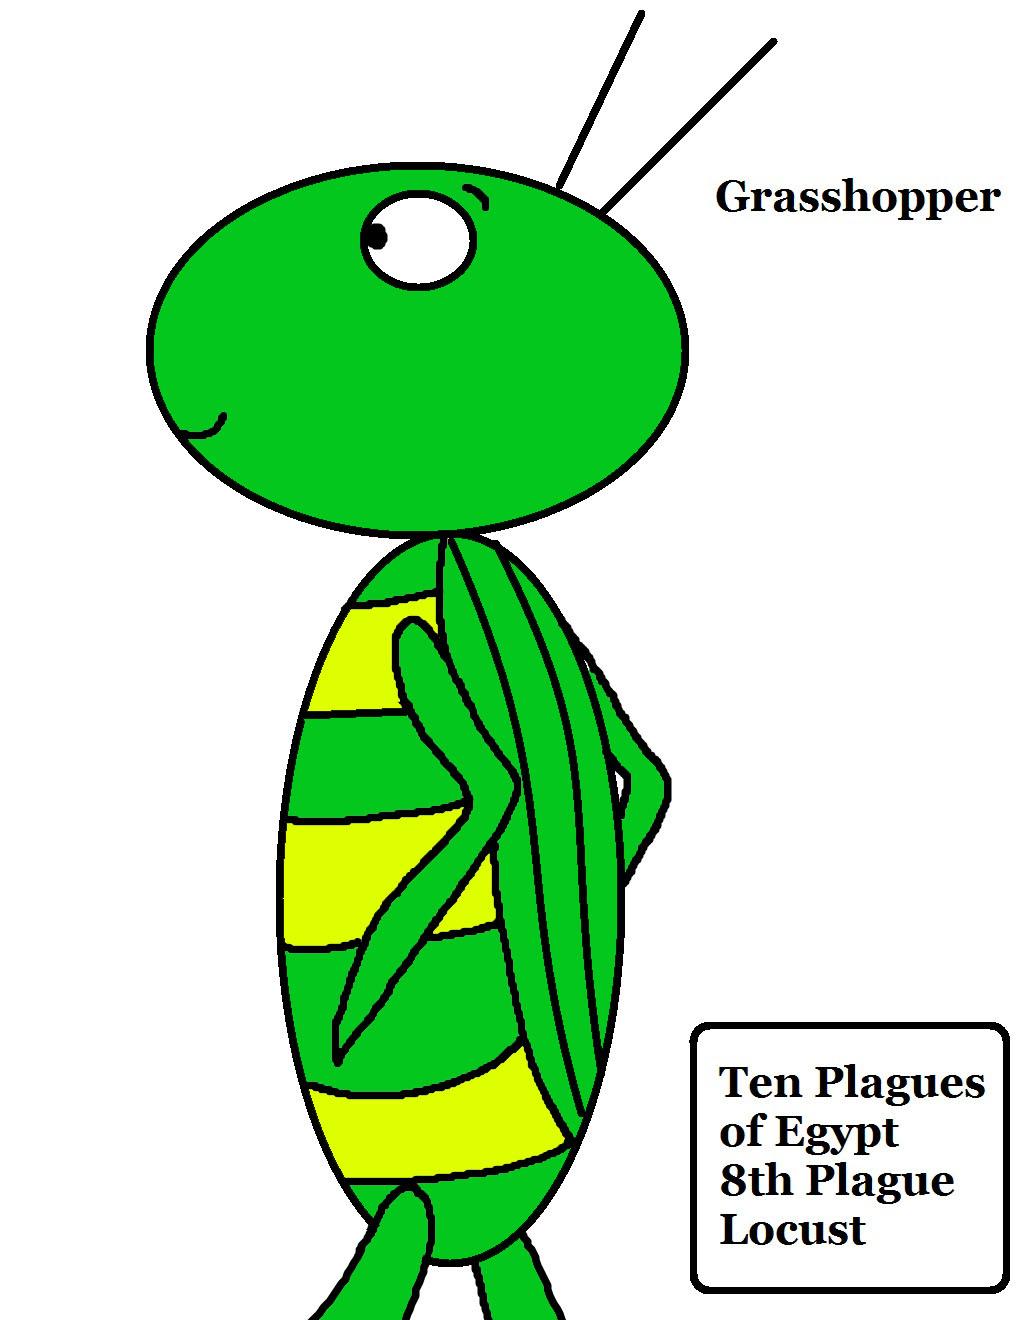 10 Plagues of Egypt Locust Lesson